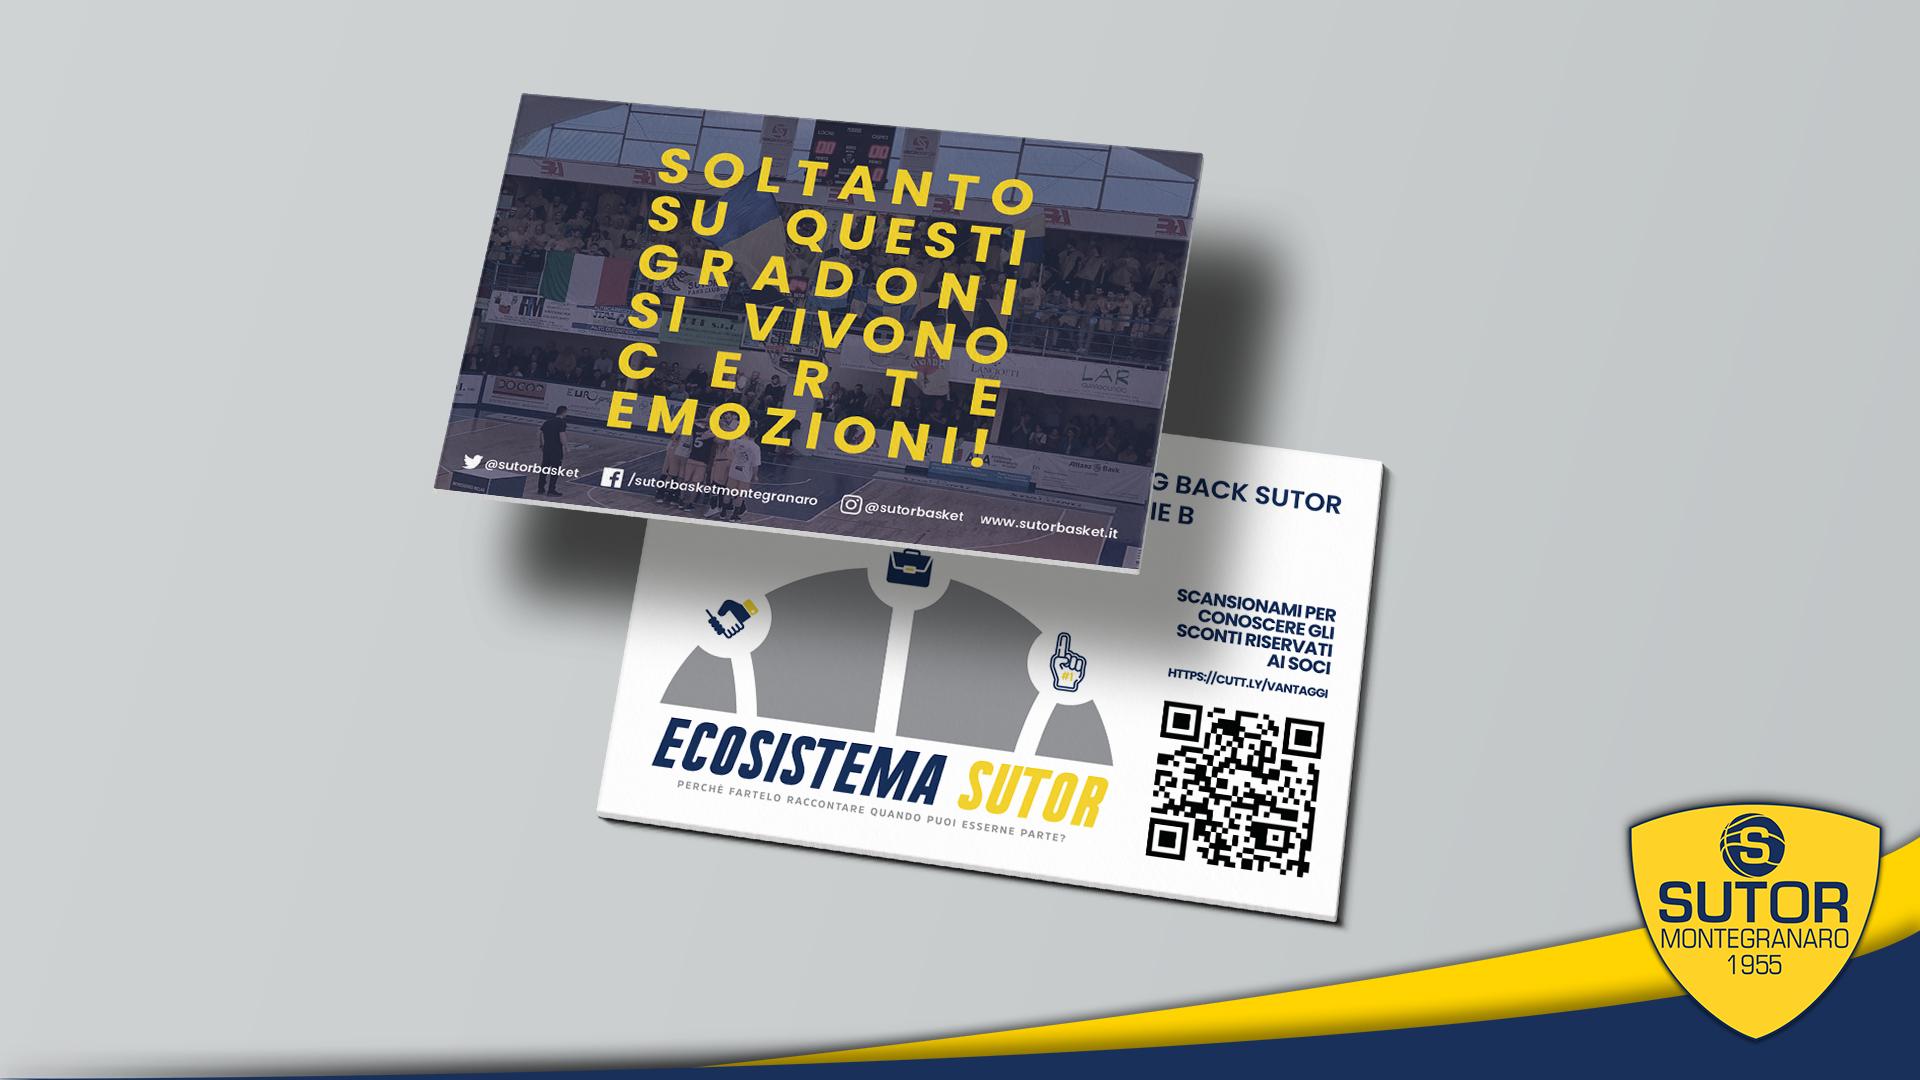 https://www.sutorbasket.it/wp-content/uploads/2019/07/tessera_socio.jpg